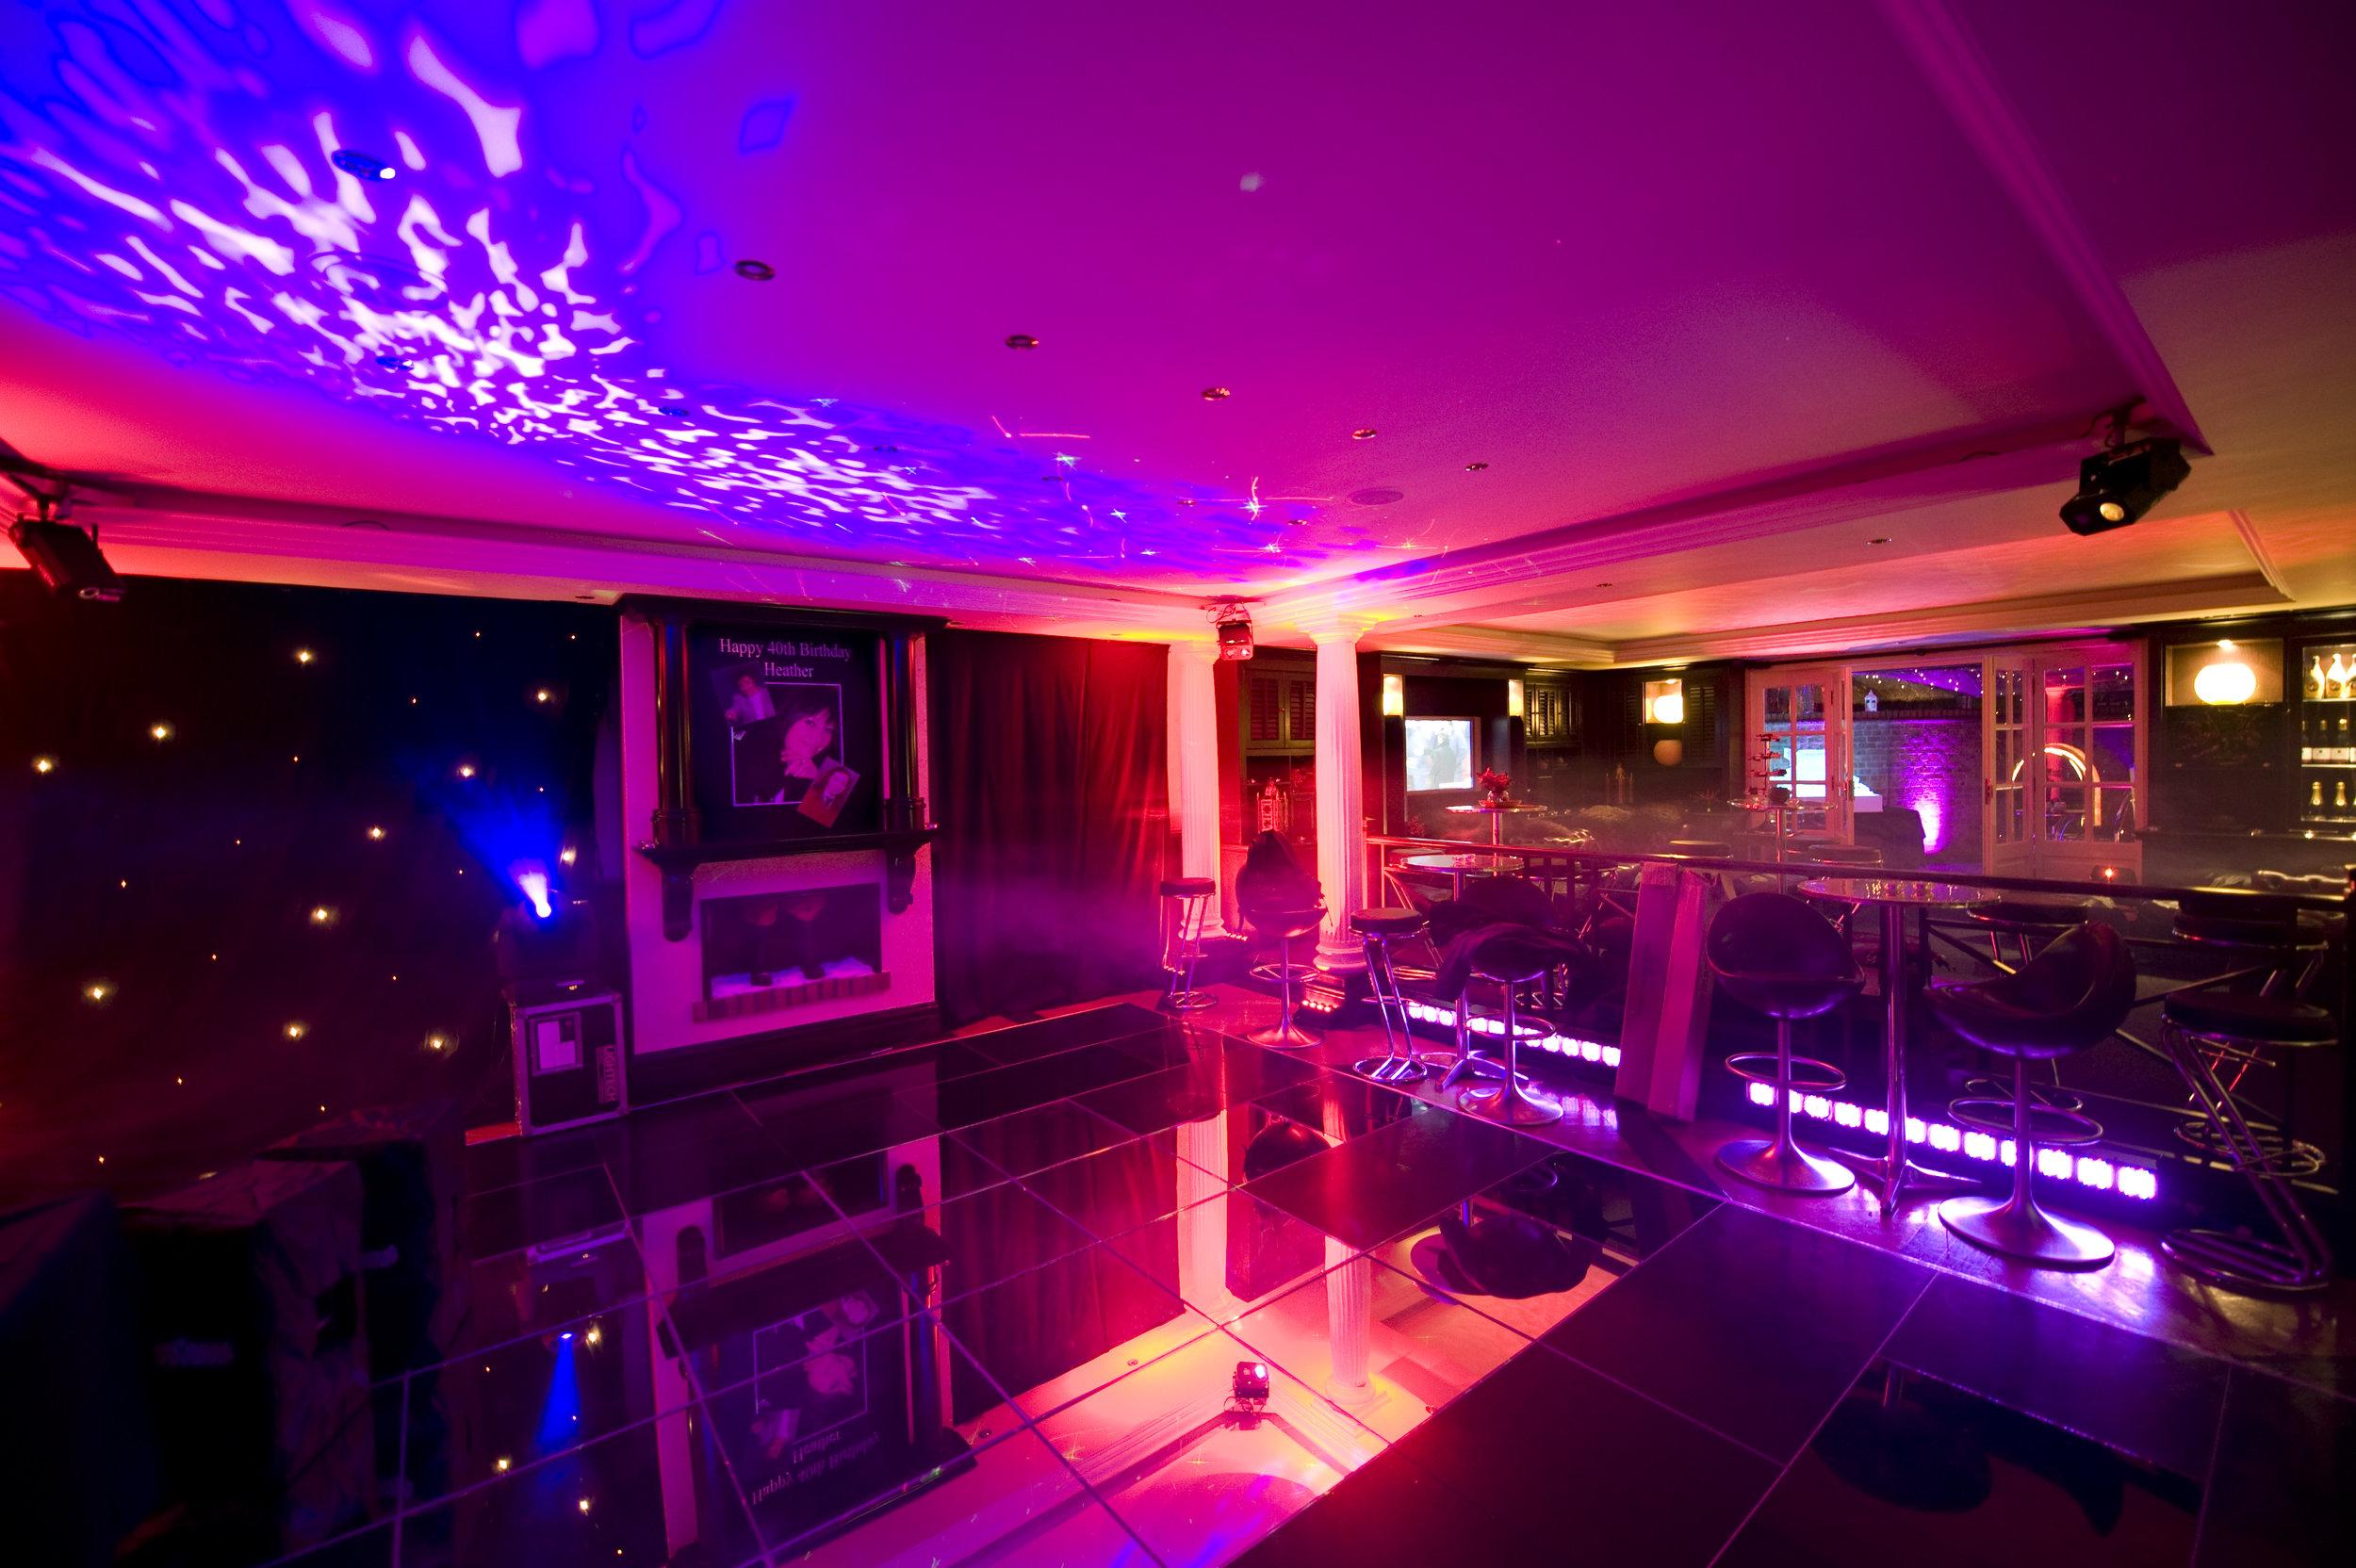 H nighclub in dining room.jpg